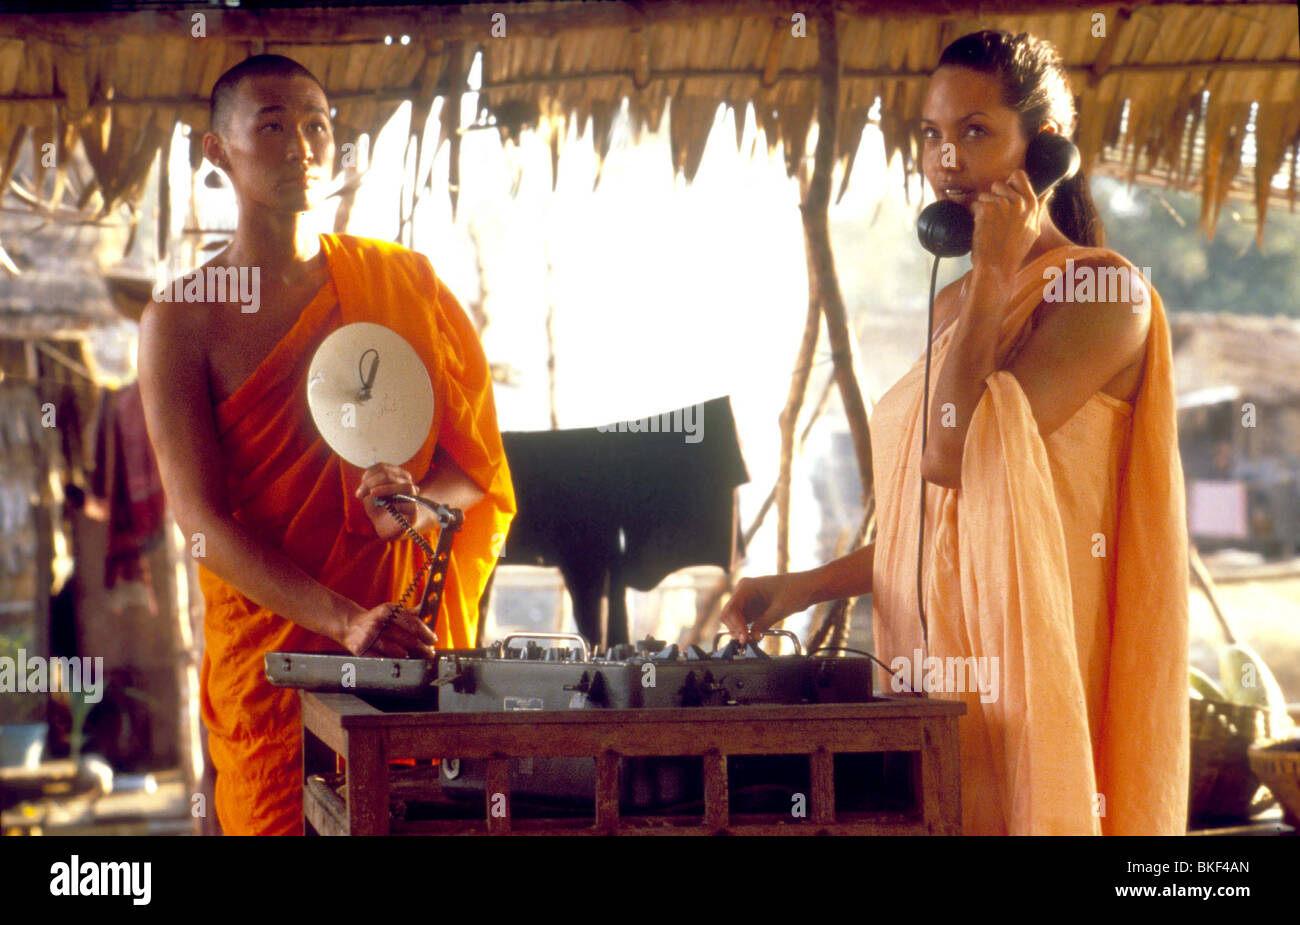 LARA CROFT: TOMB RAIDER (2001) ANGELINA JOLIE TBRR 086 - Stock Image